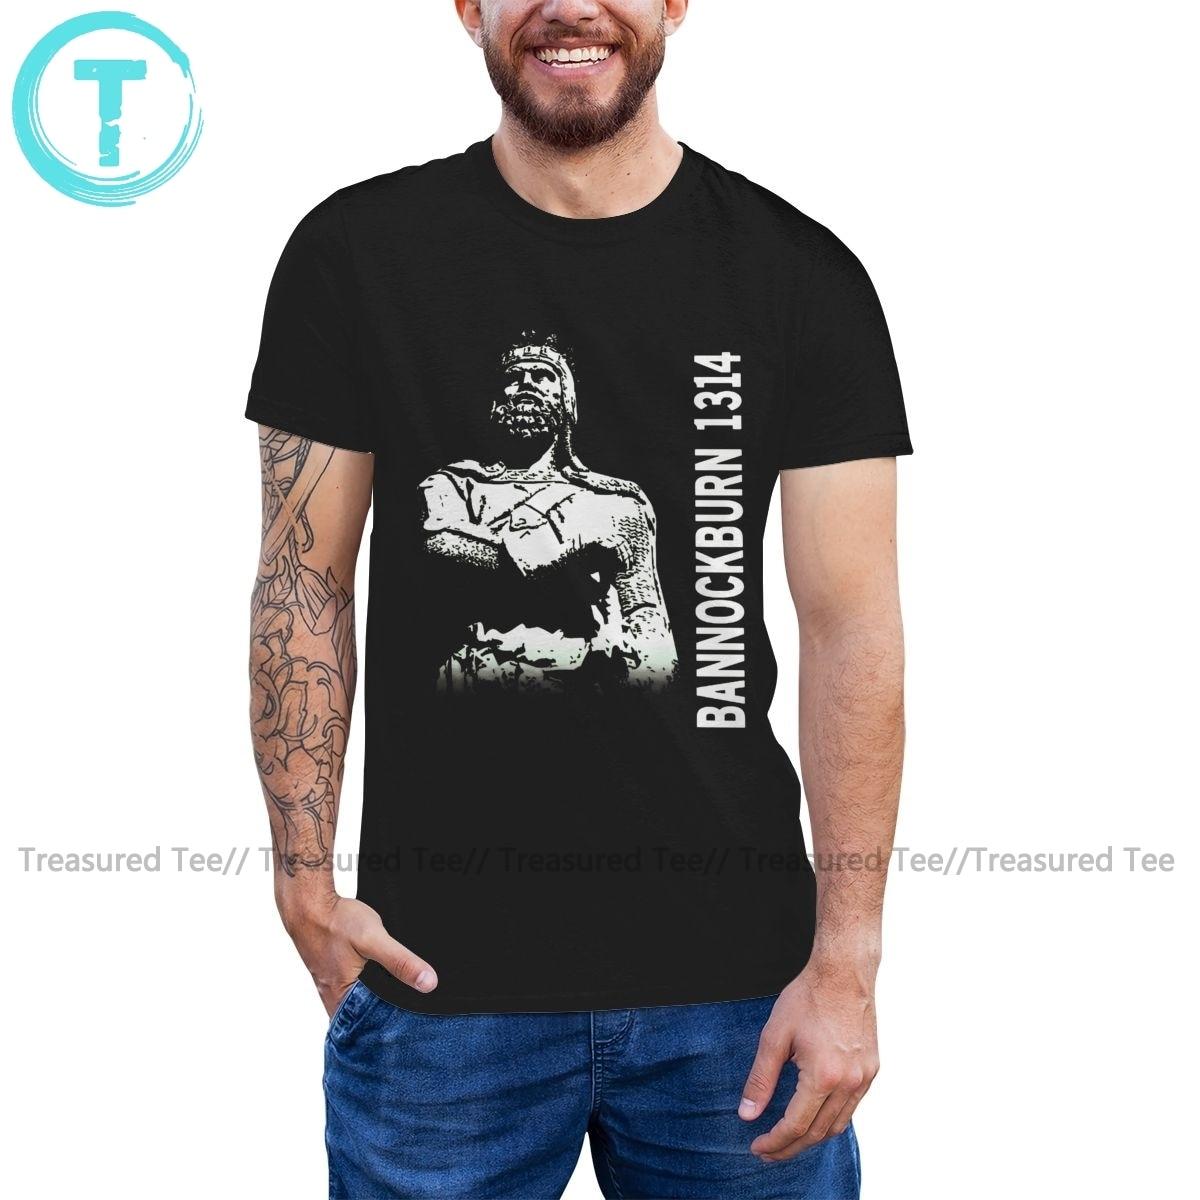 Robert T Camisa Robert The Bruce Bannock Burn T-Shirt Streetwear Tee Impressão Camisa Curto-Luva Homem Tshirt